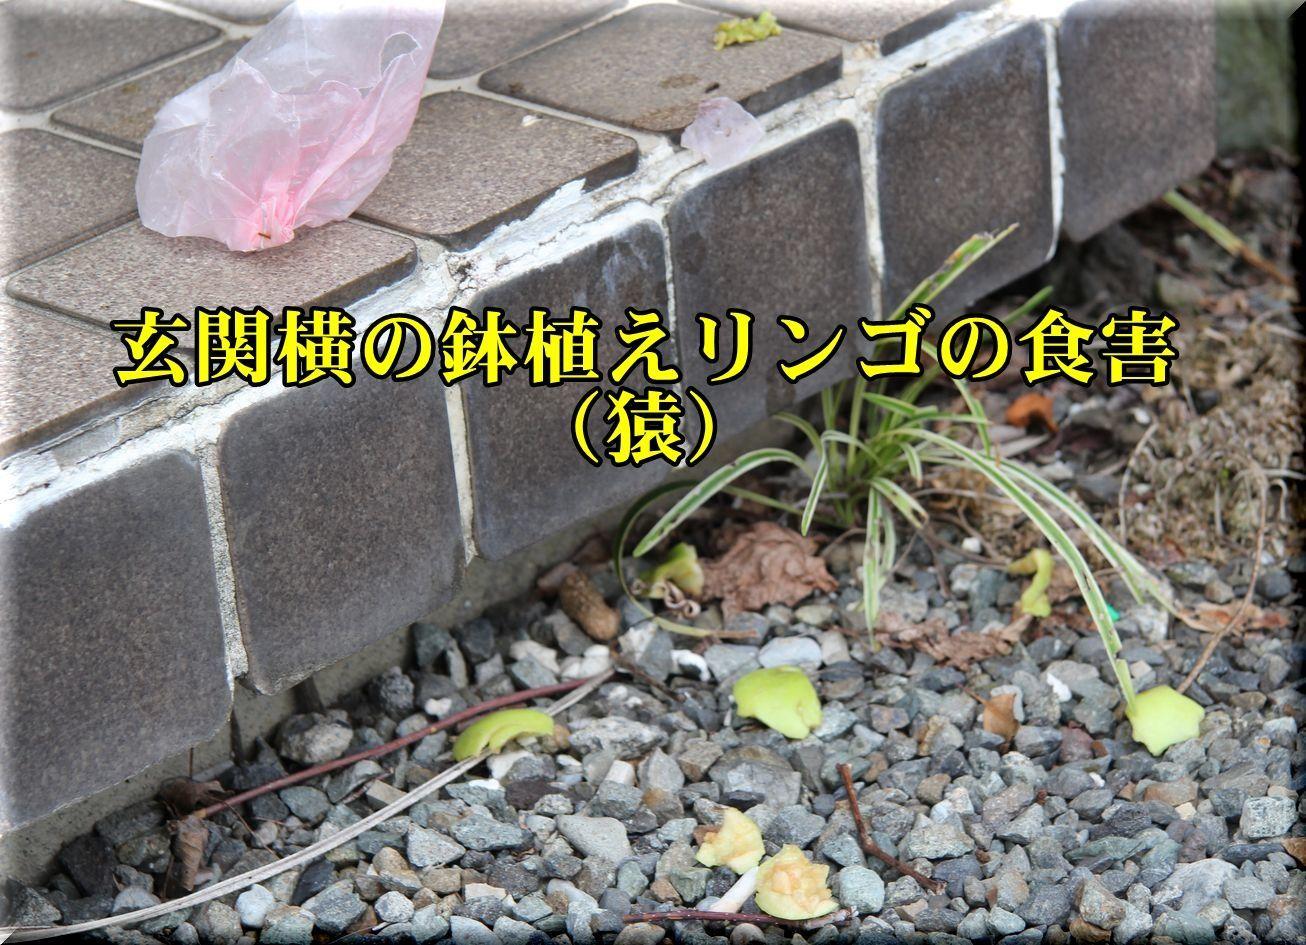 1saru180721.jpg